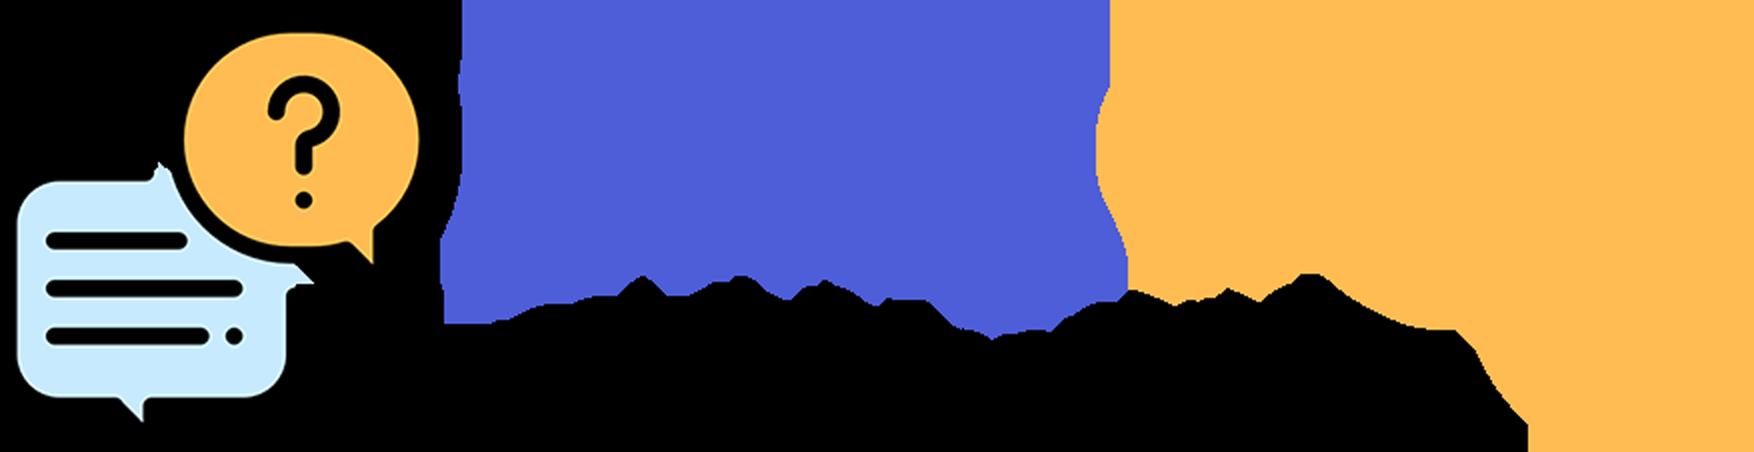 Demo Kunden Portal Logo